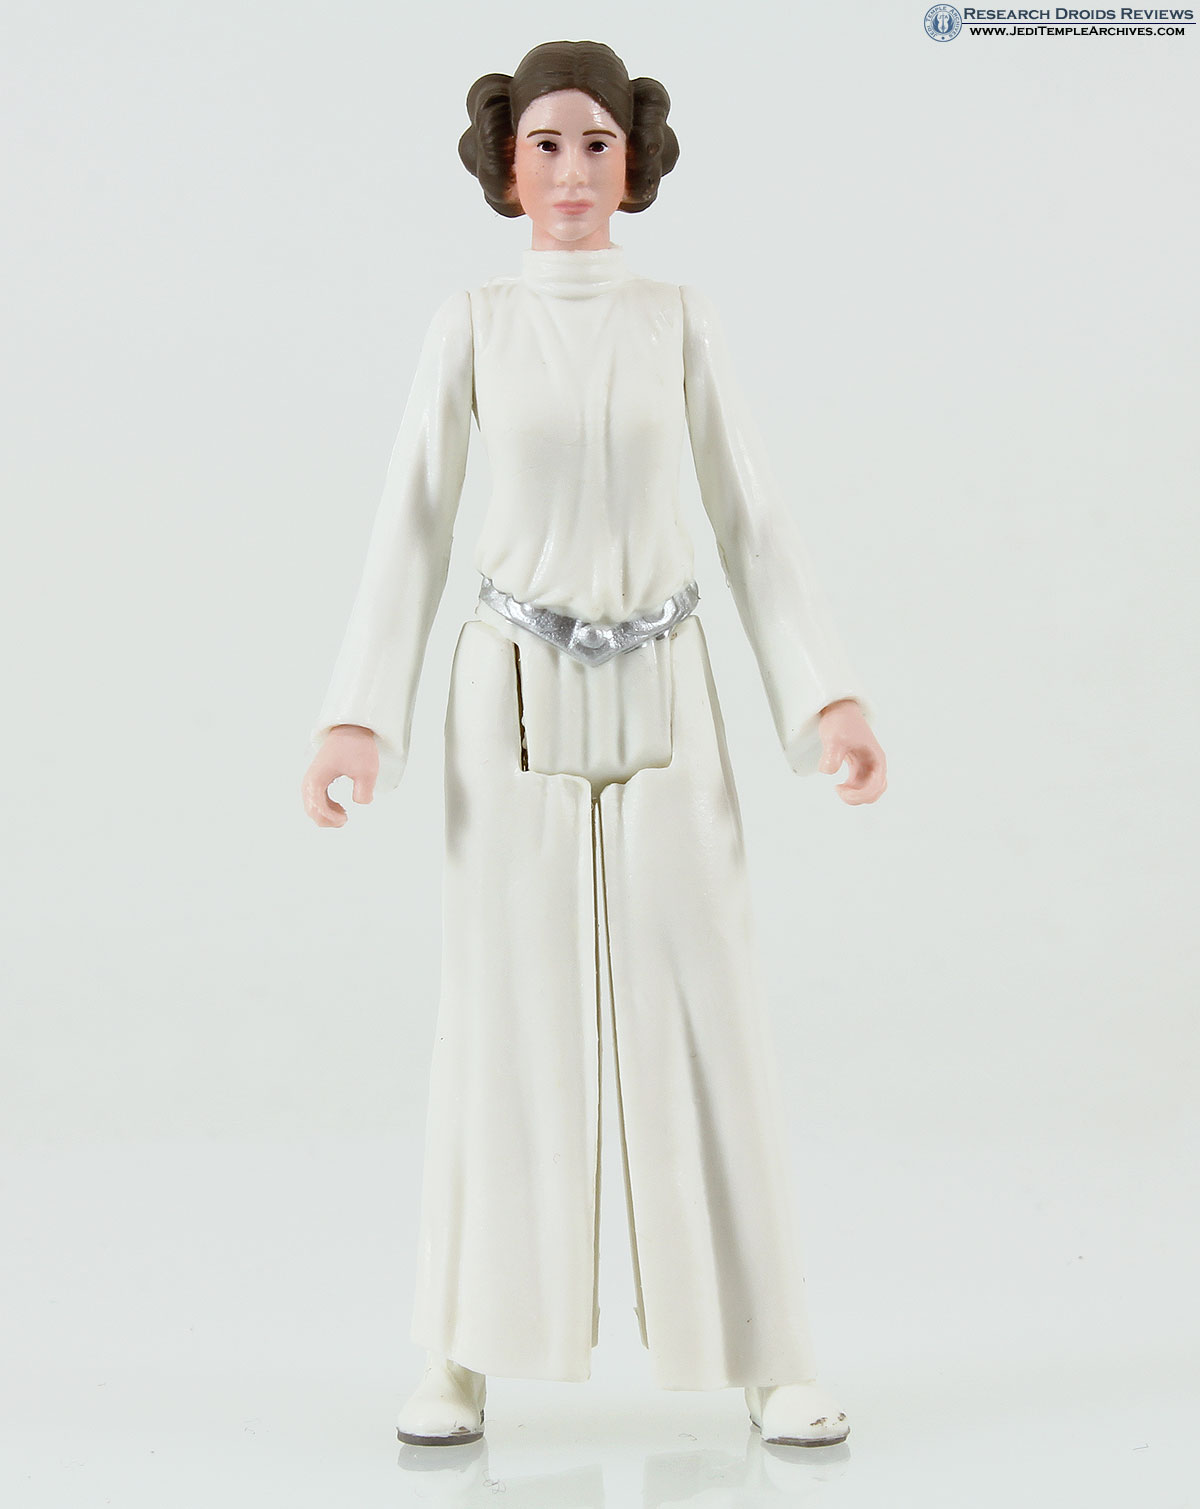 Princess Leia | Princess Leia and Luke Skywalker Stormtrooper Disguise